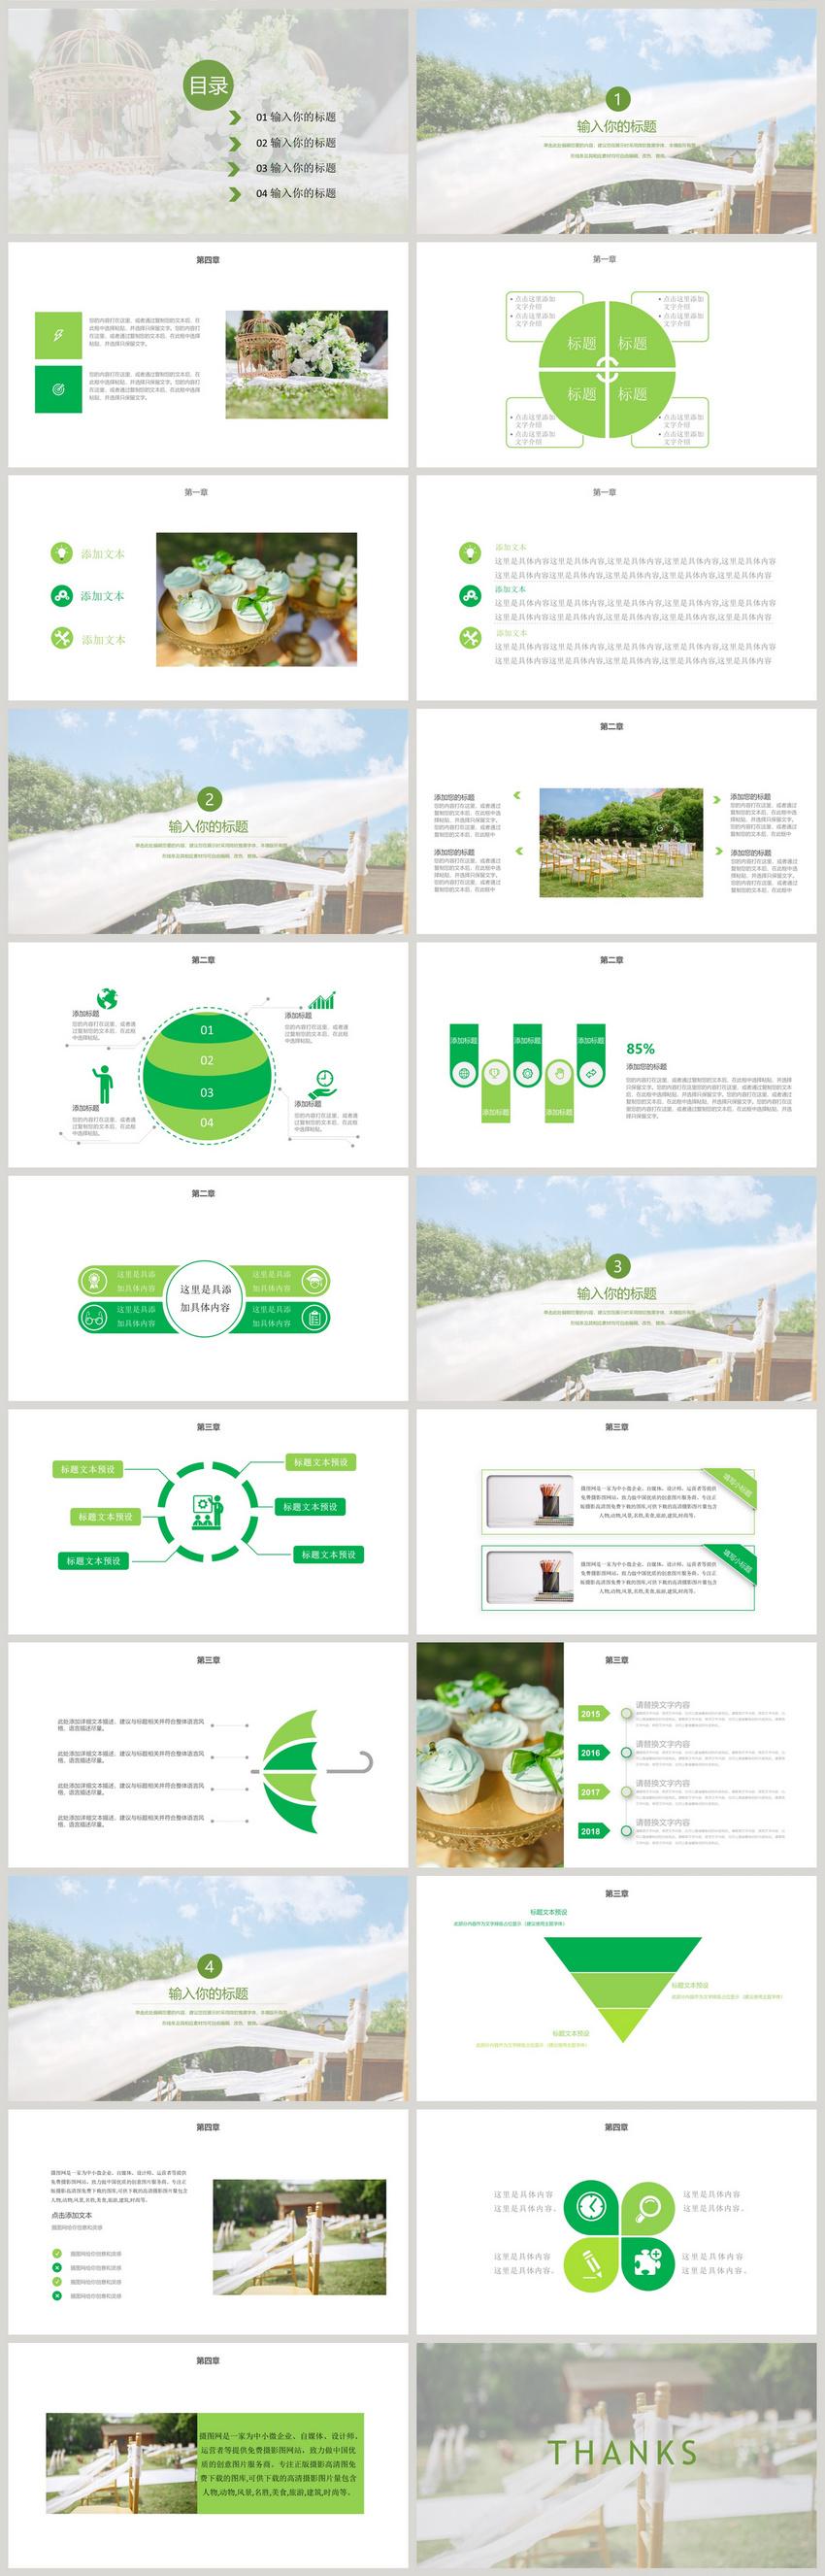 Fresh green grassland wedding planning ppt template powerpoint